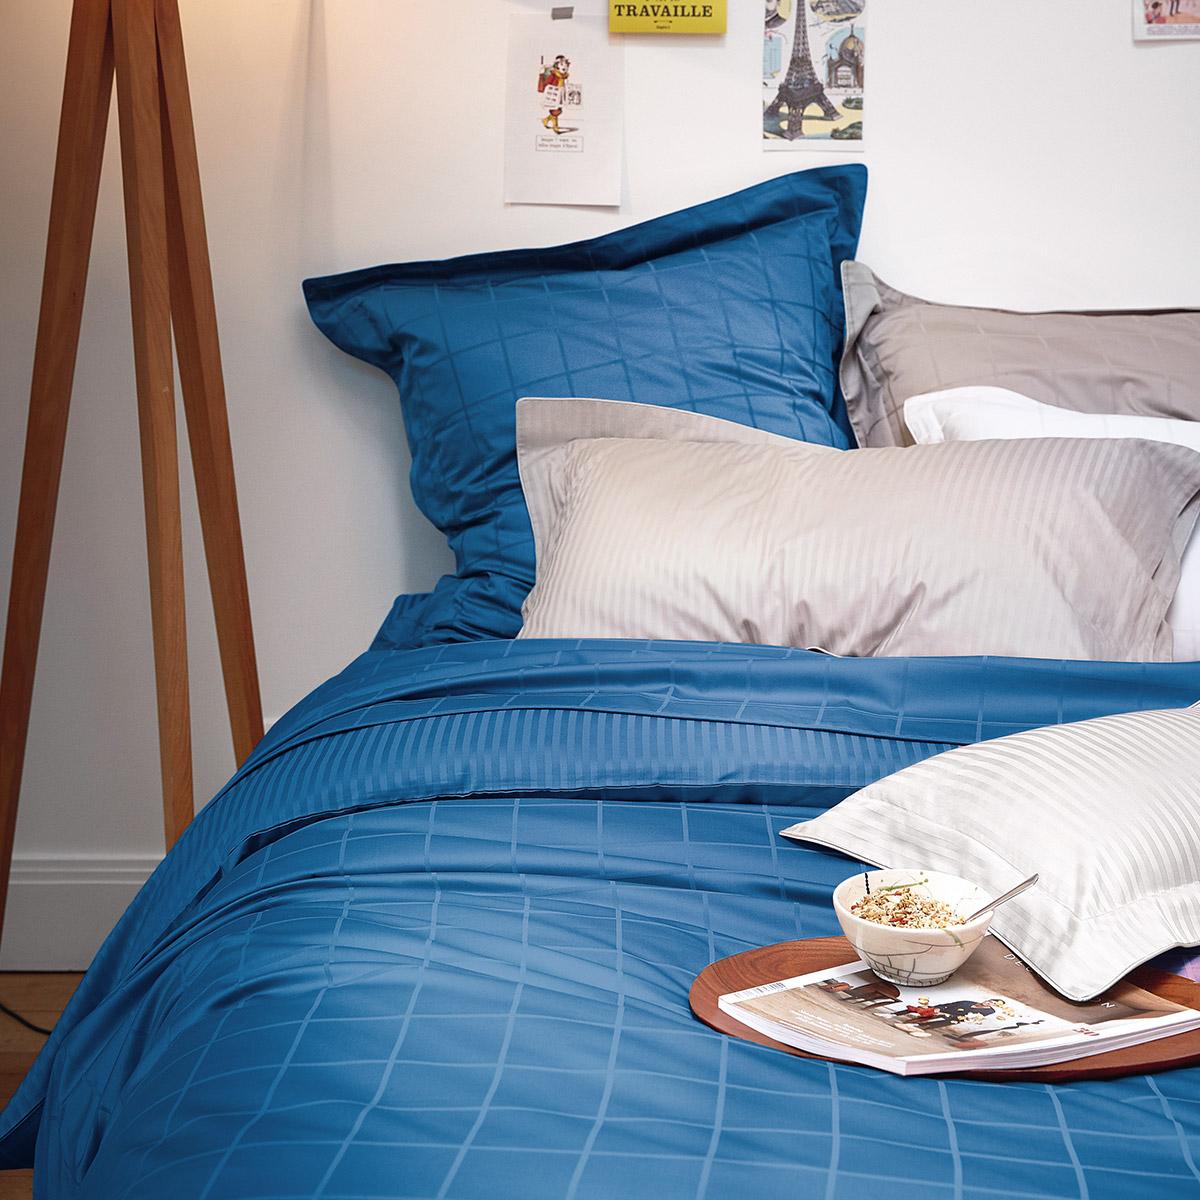 Drap housse satin Bleu 140 x 200 cm